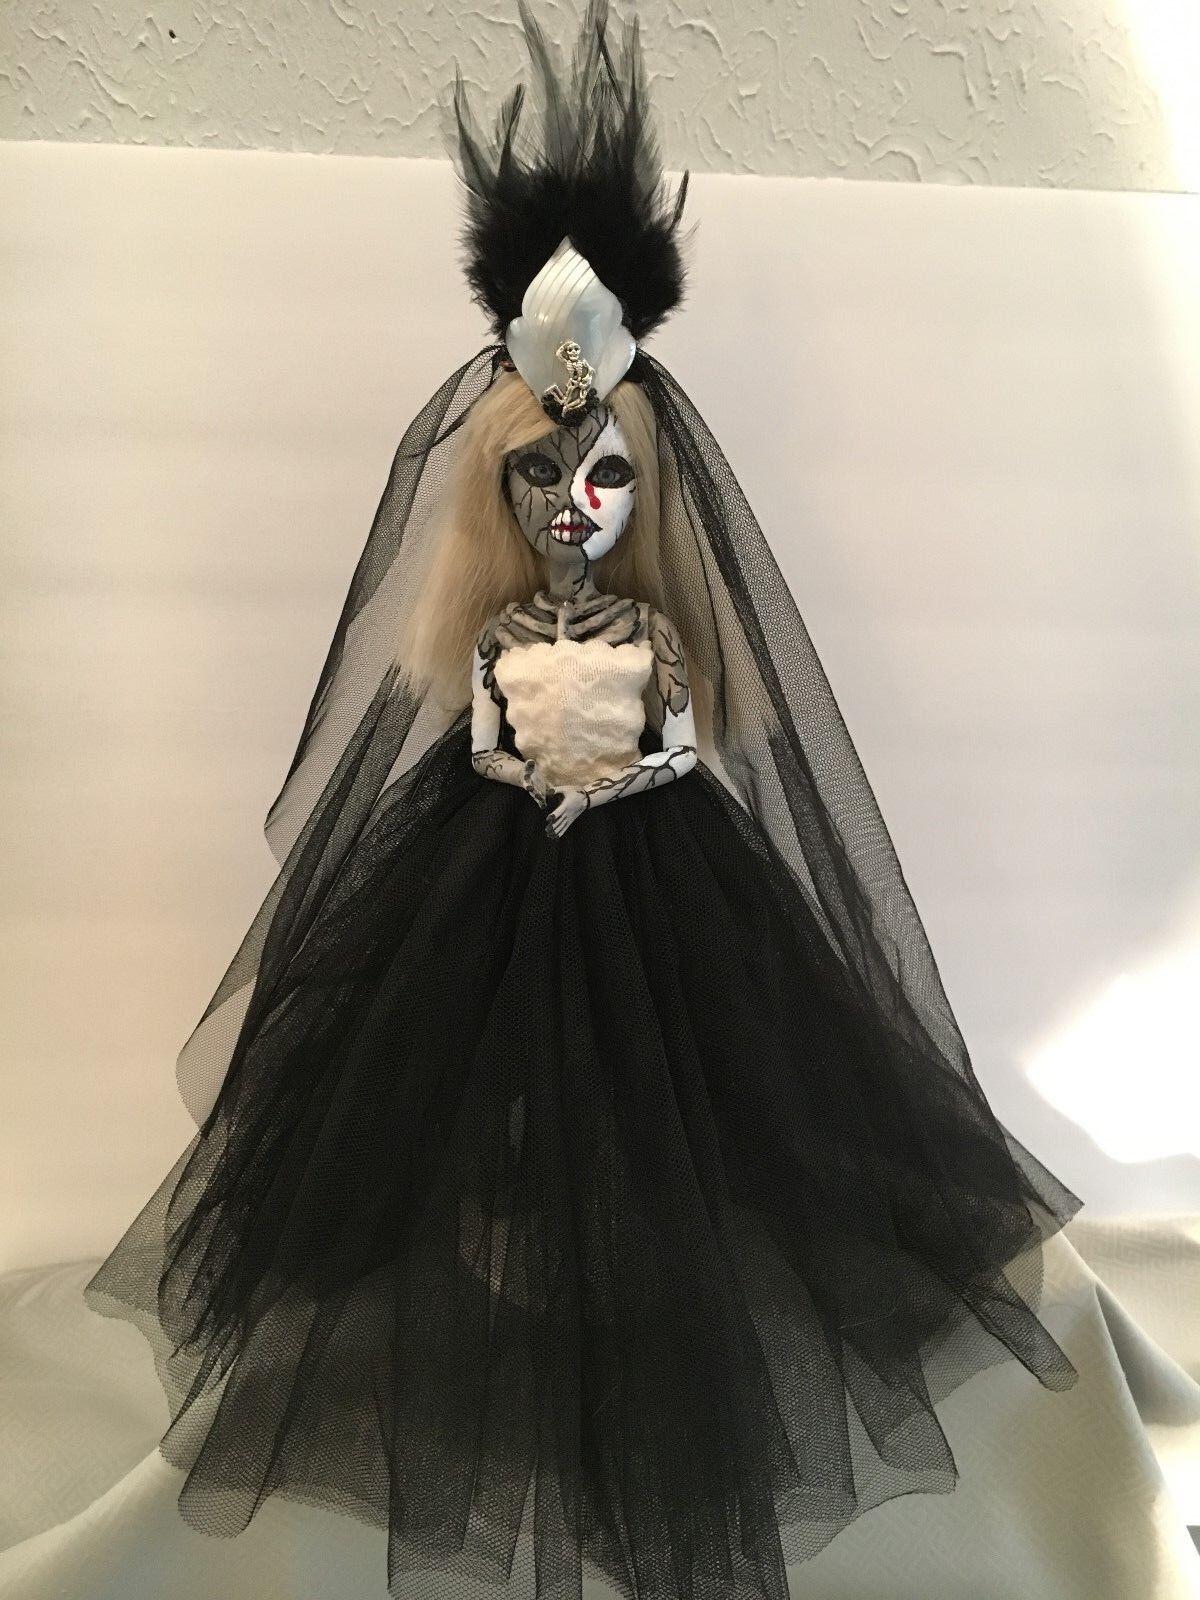 Horror Gótico Halloween Lindo muerto espeluznante Muñeca 11 2 cara OOAK jewlflower